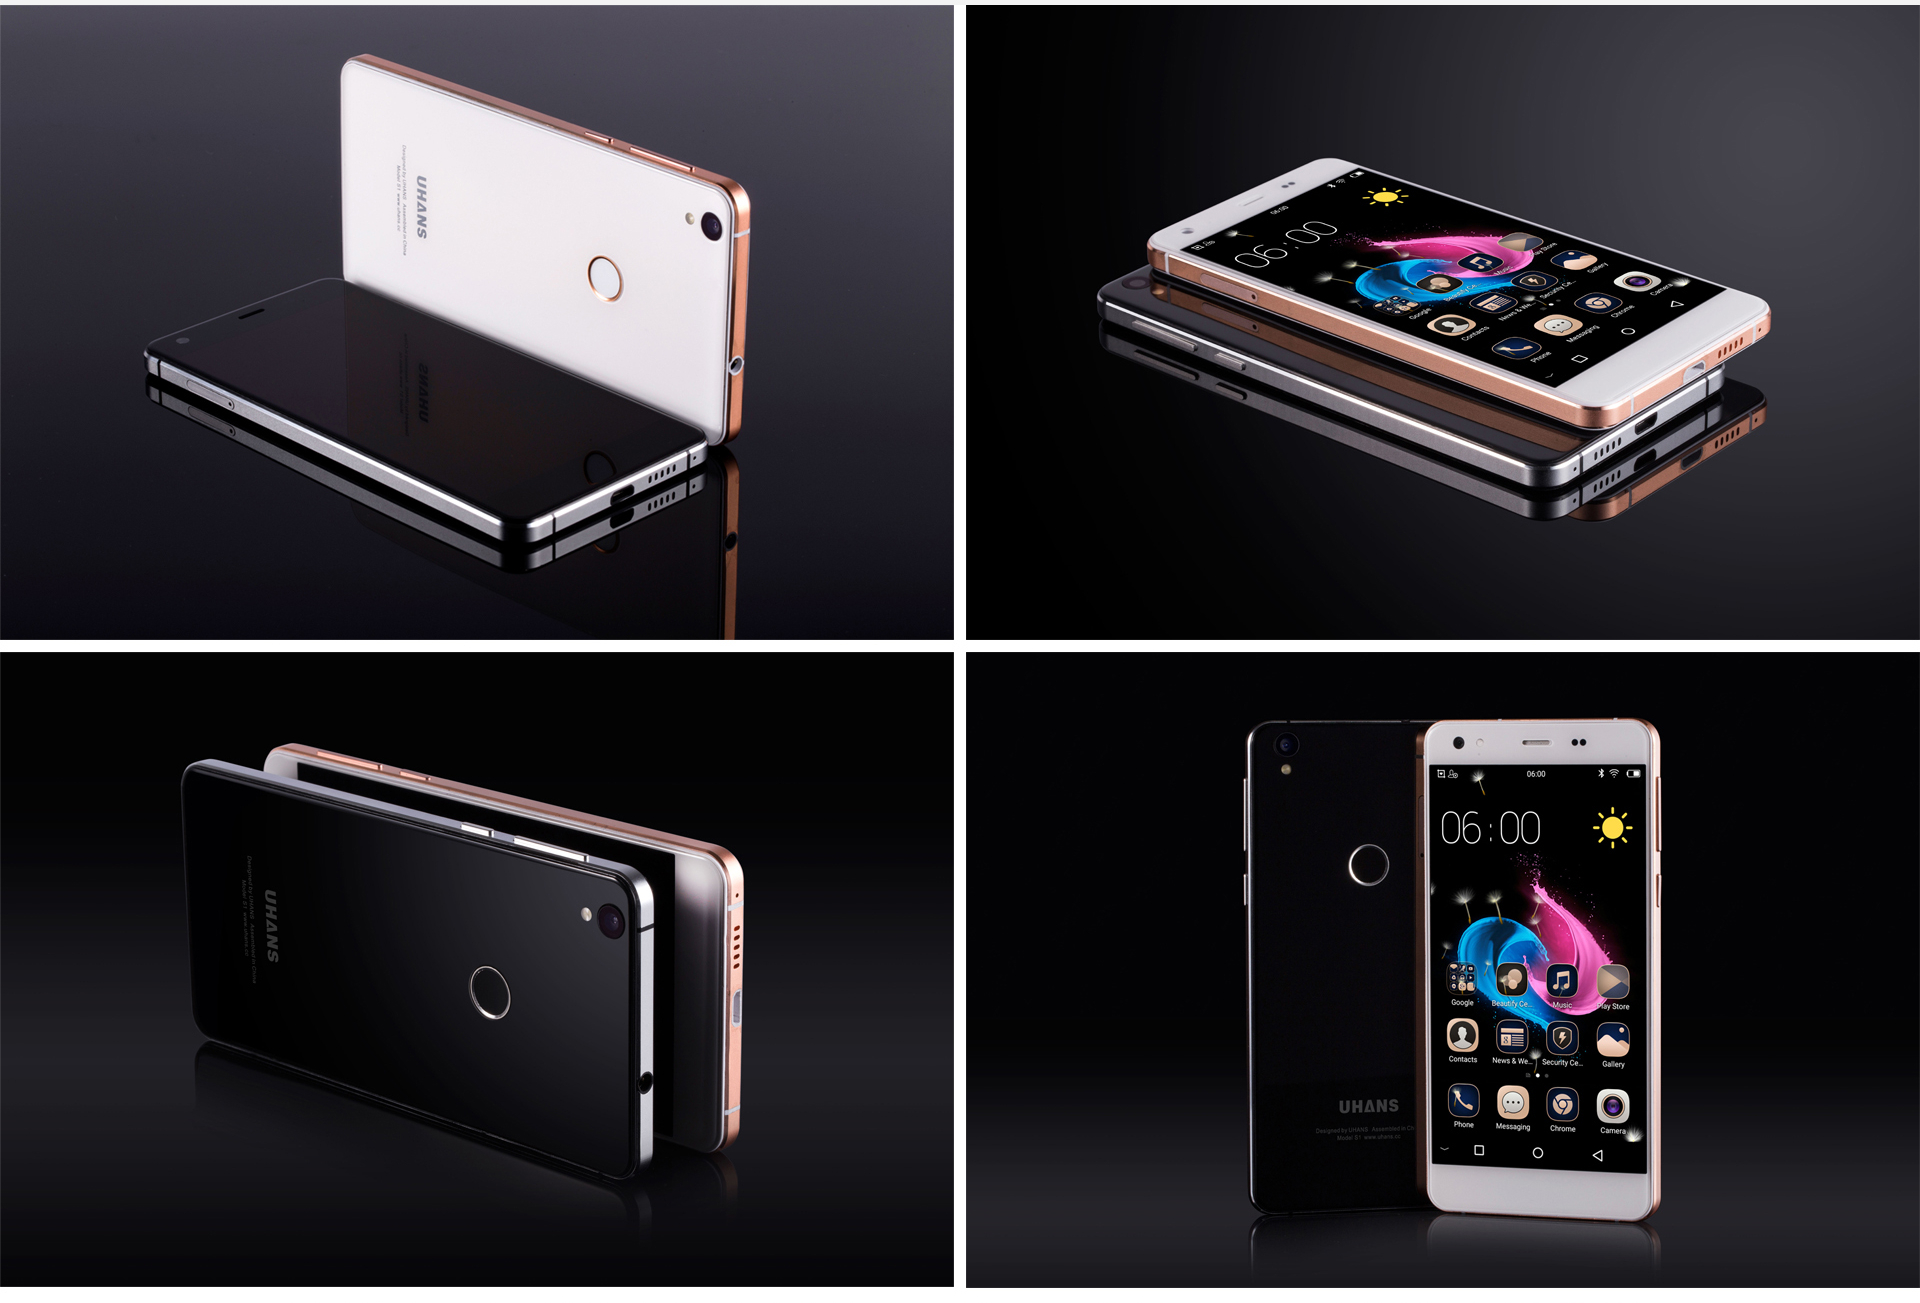 UHANS S1 Smartphone Review - NotebookCheck net Reviews